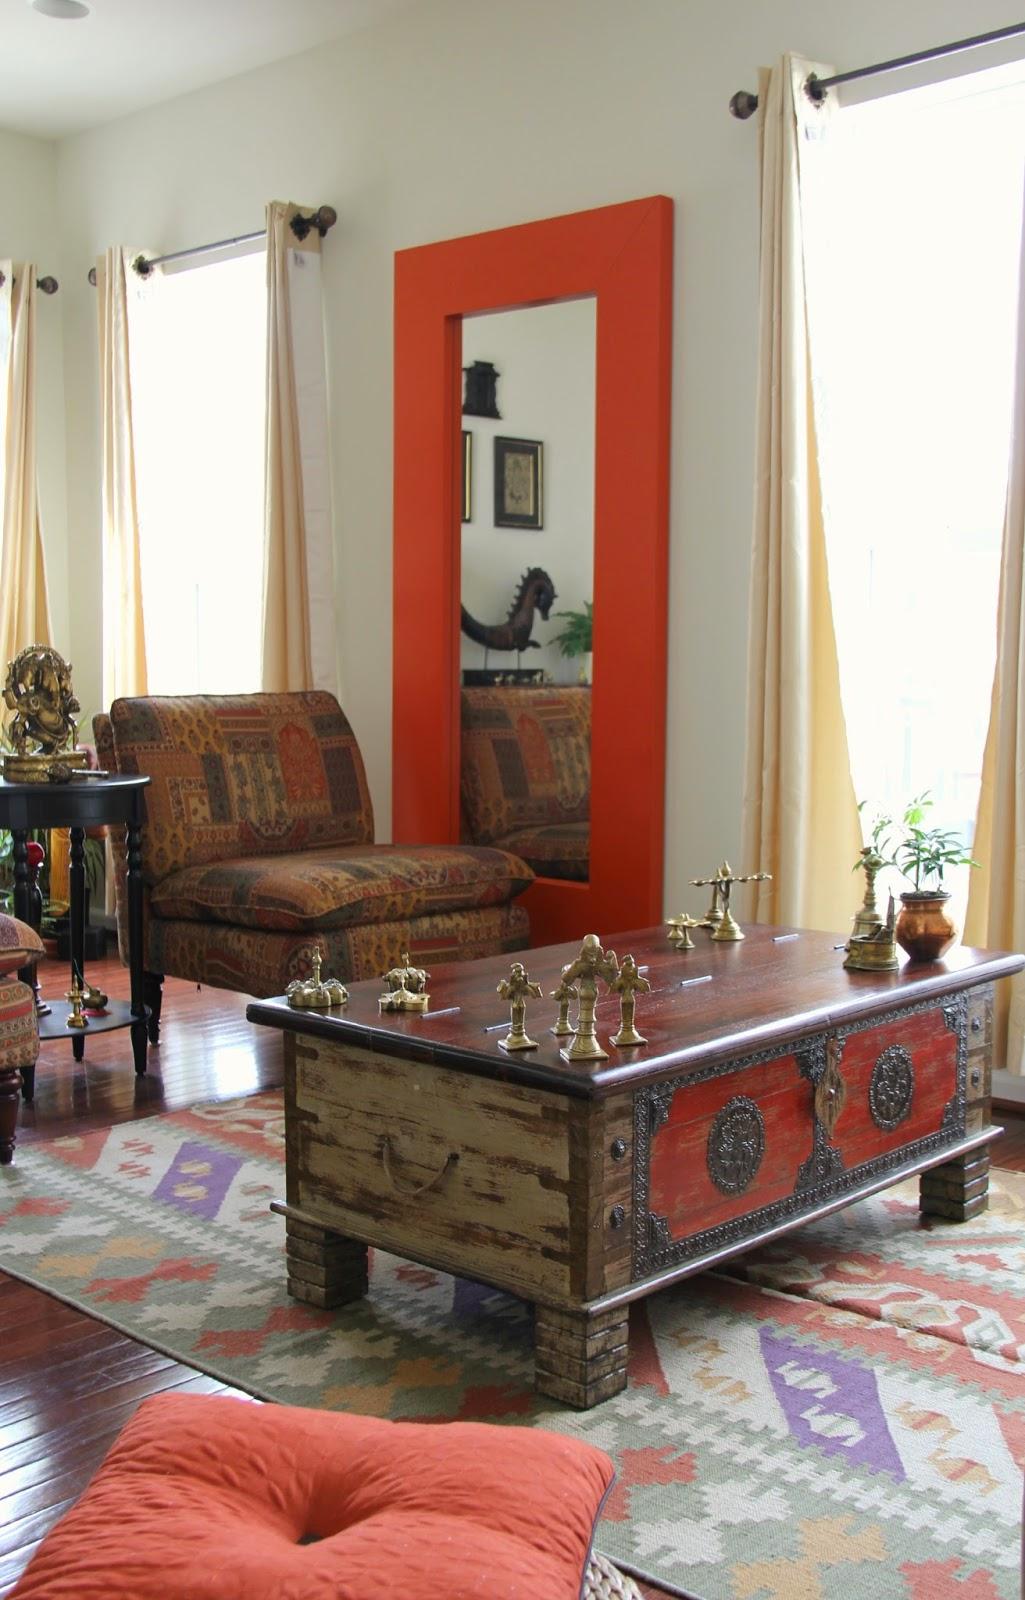 Rajee sood eye candy before diwali for Living room 94 answers